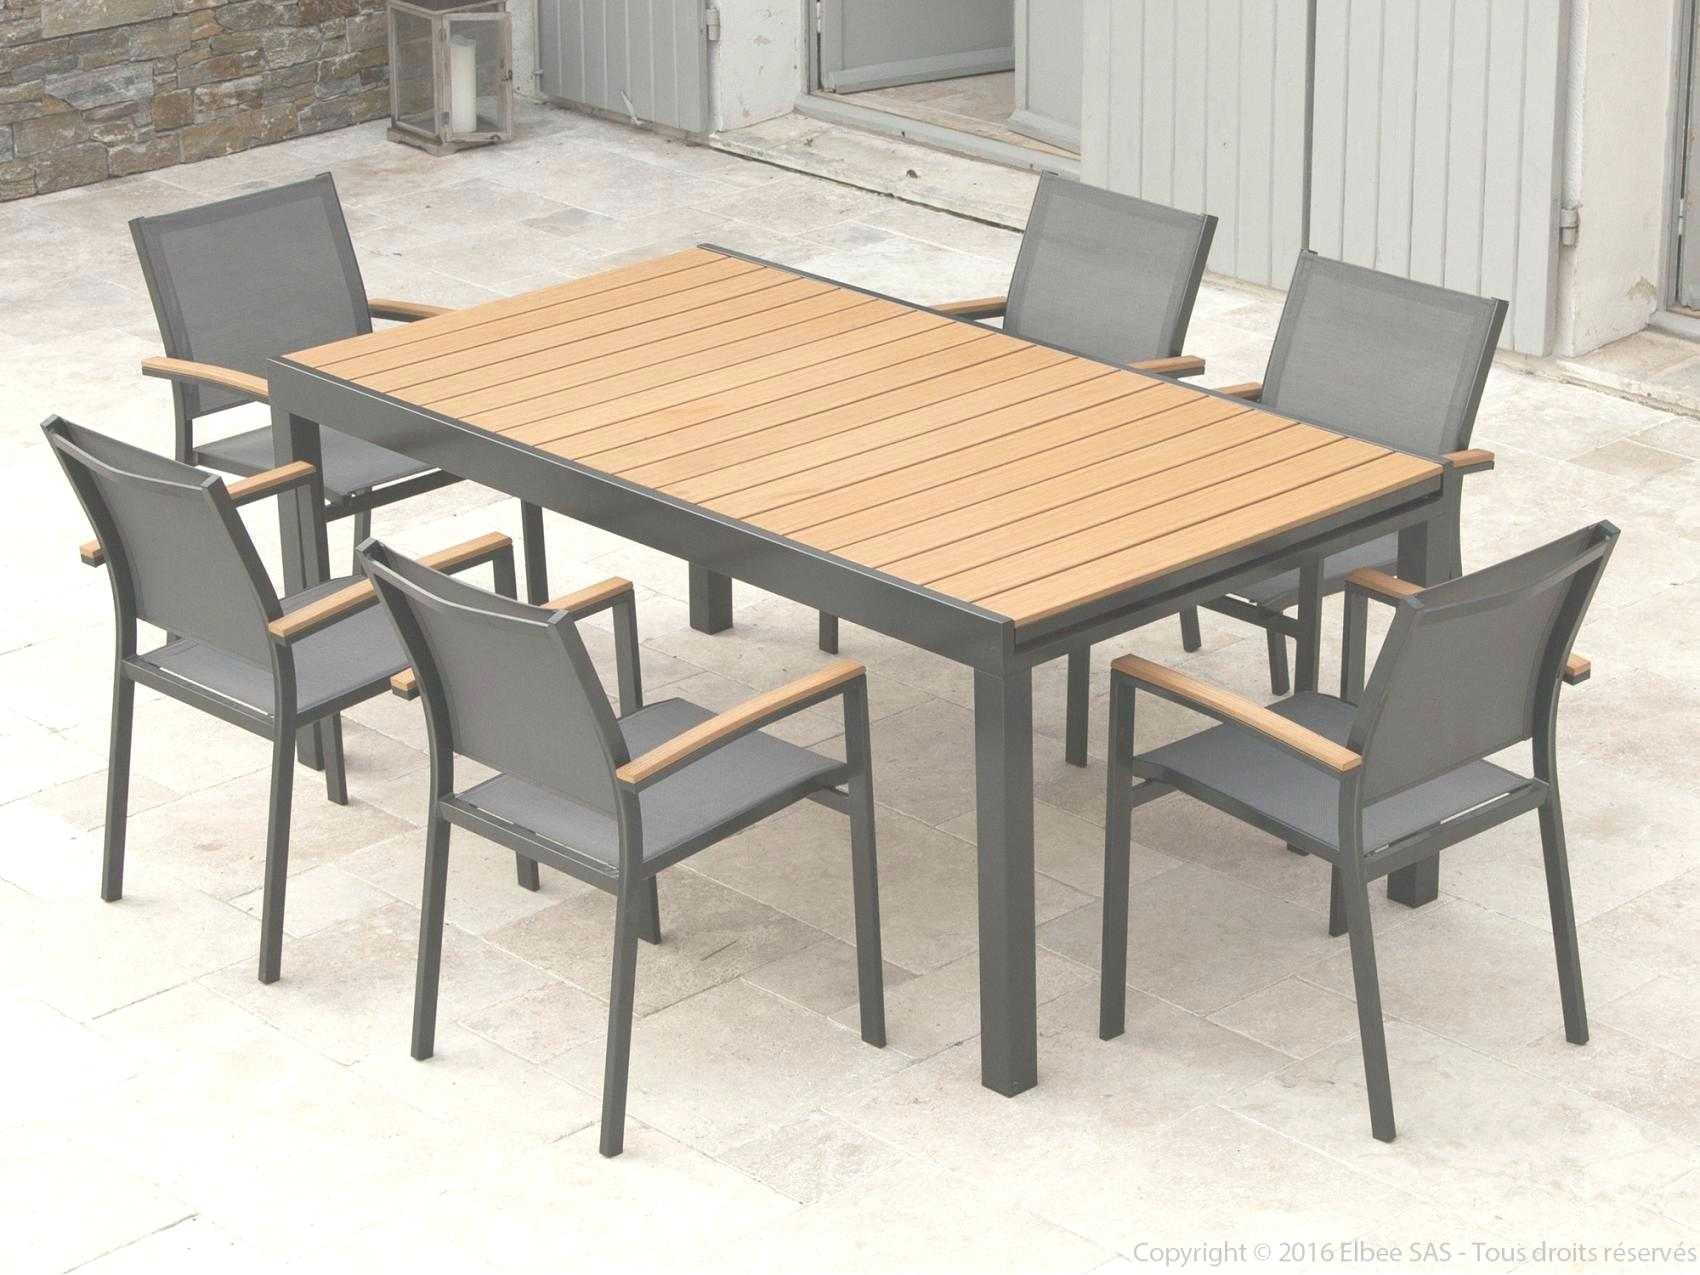 Table salon de jardin imitation bois - Jardin piscine et Cabane